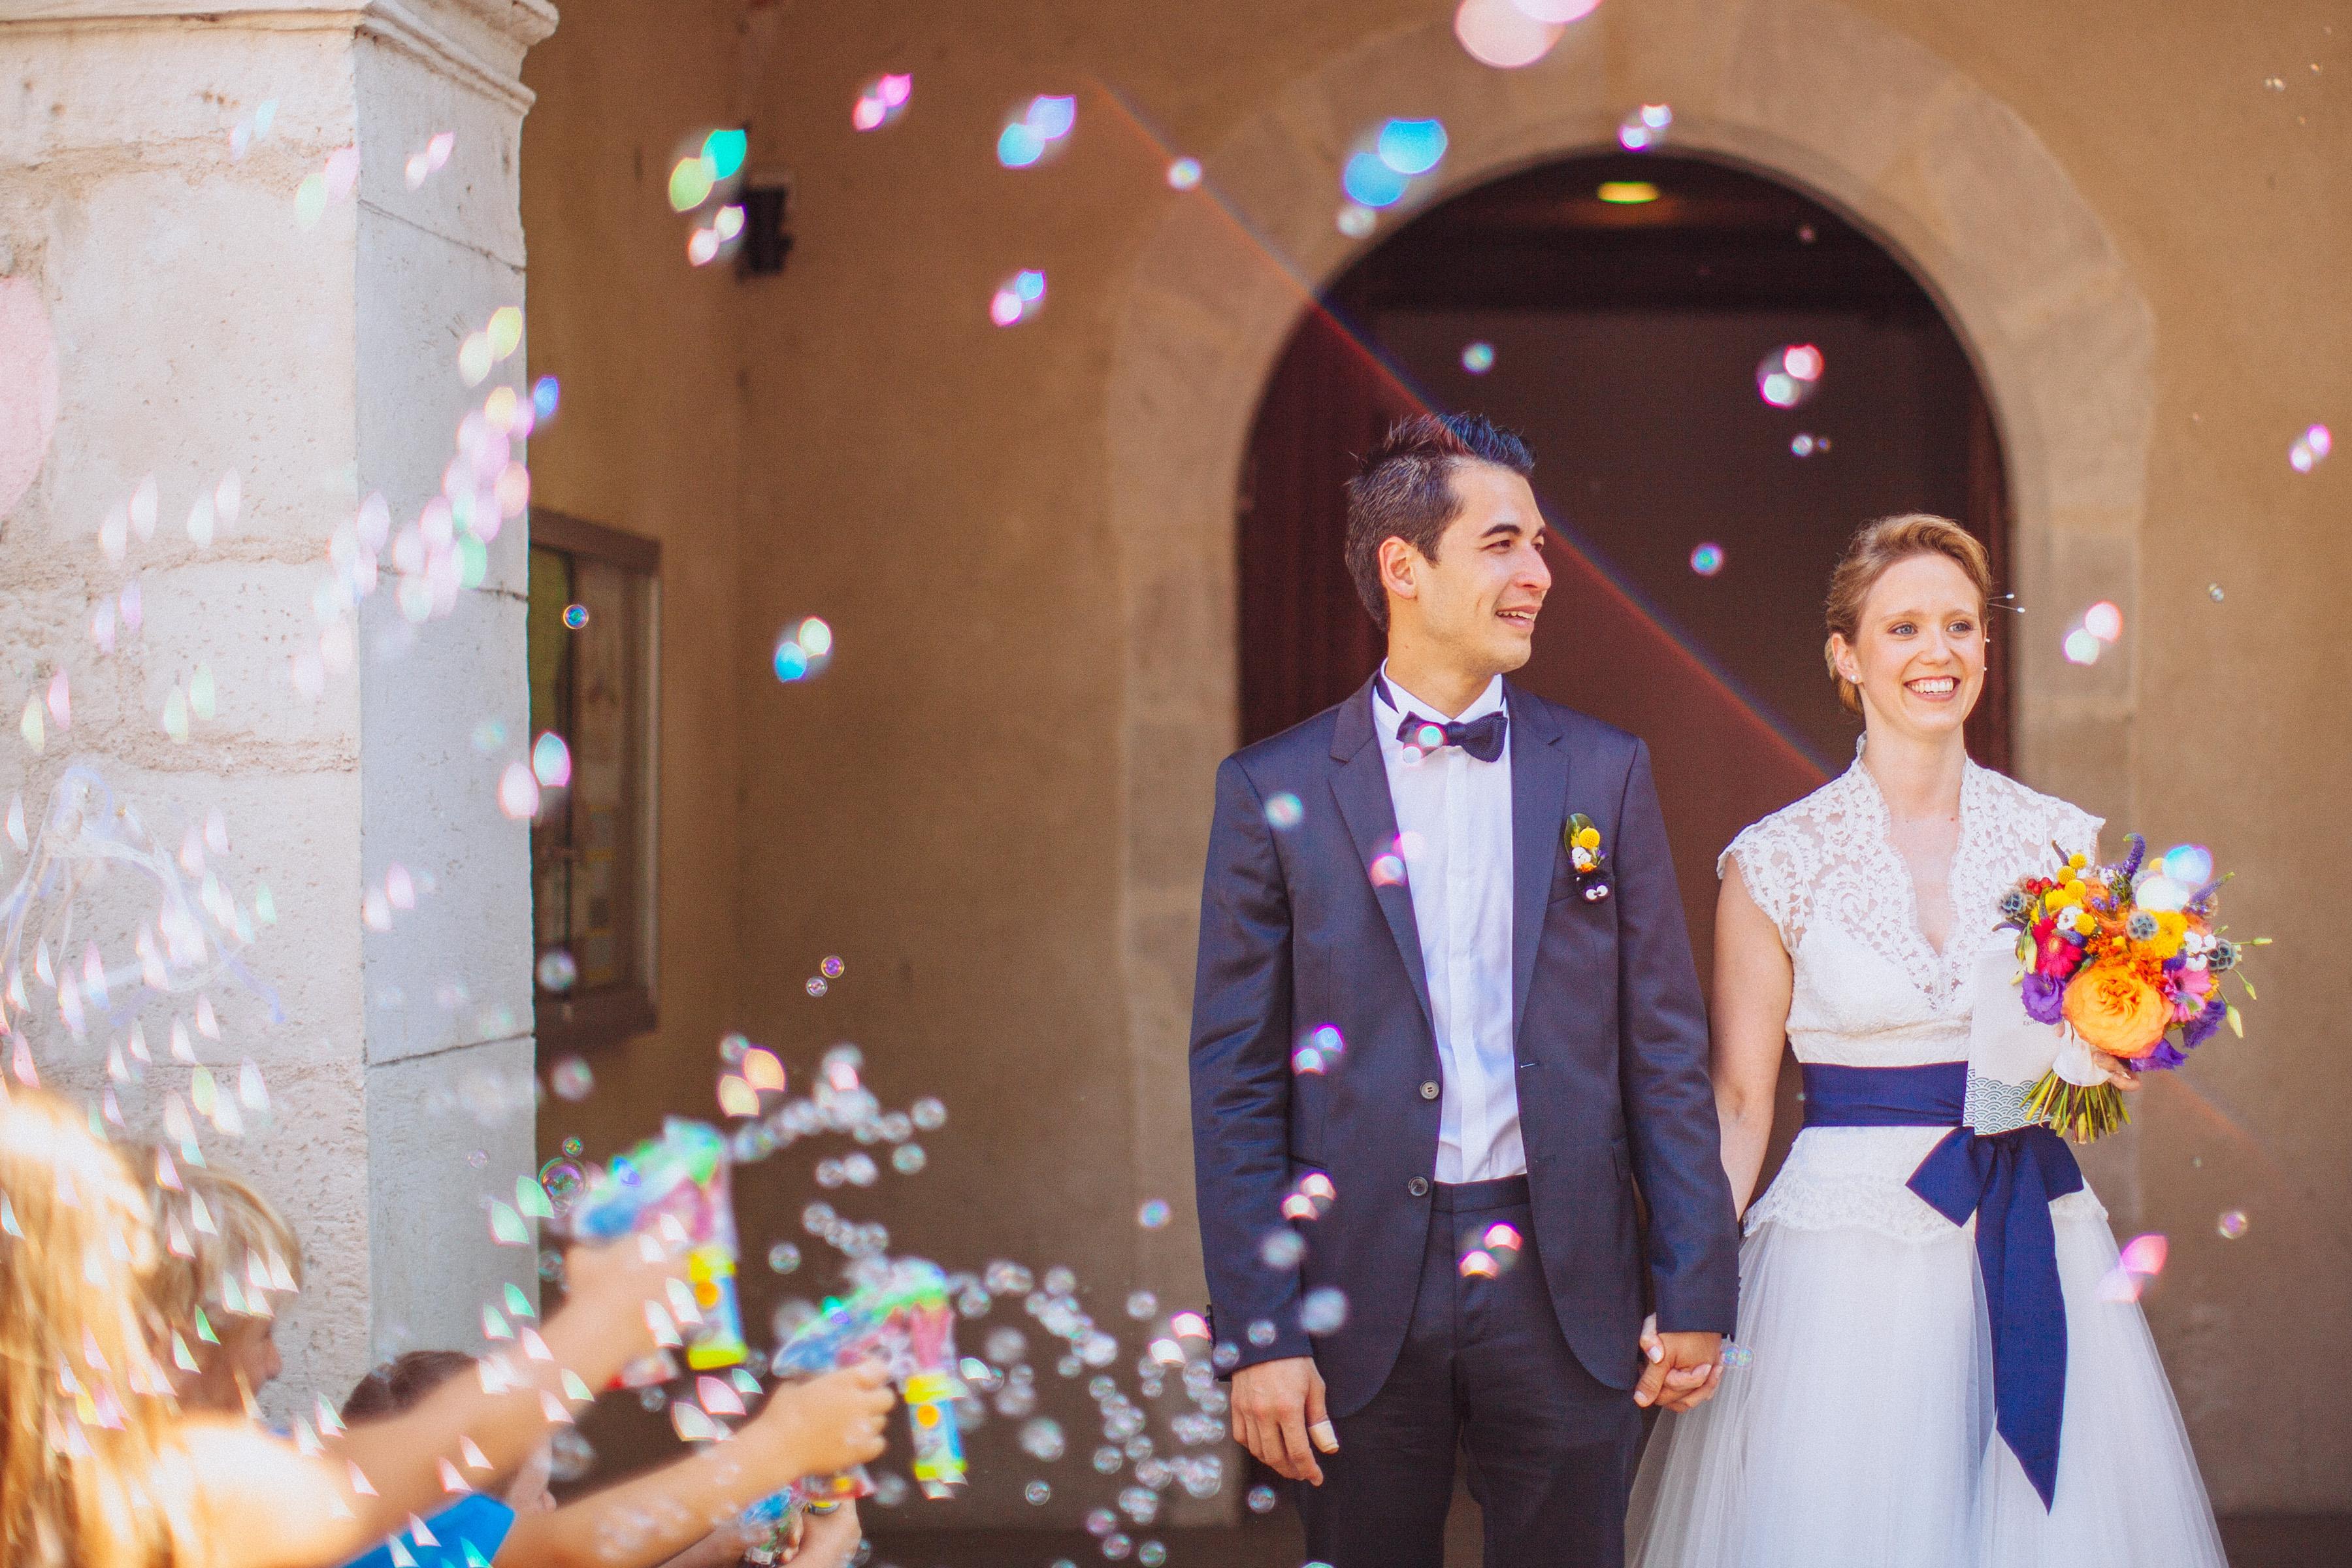 camille_nico___mariage_____ricardo_vieira_photographe_Ma-Vie-de-Boheme_206